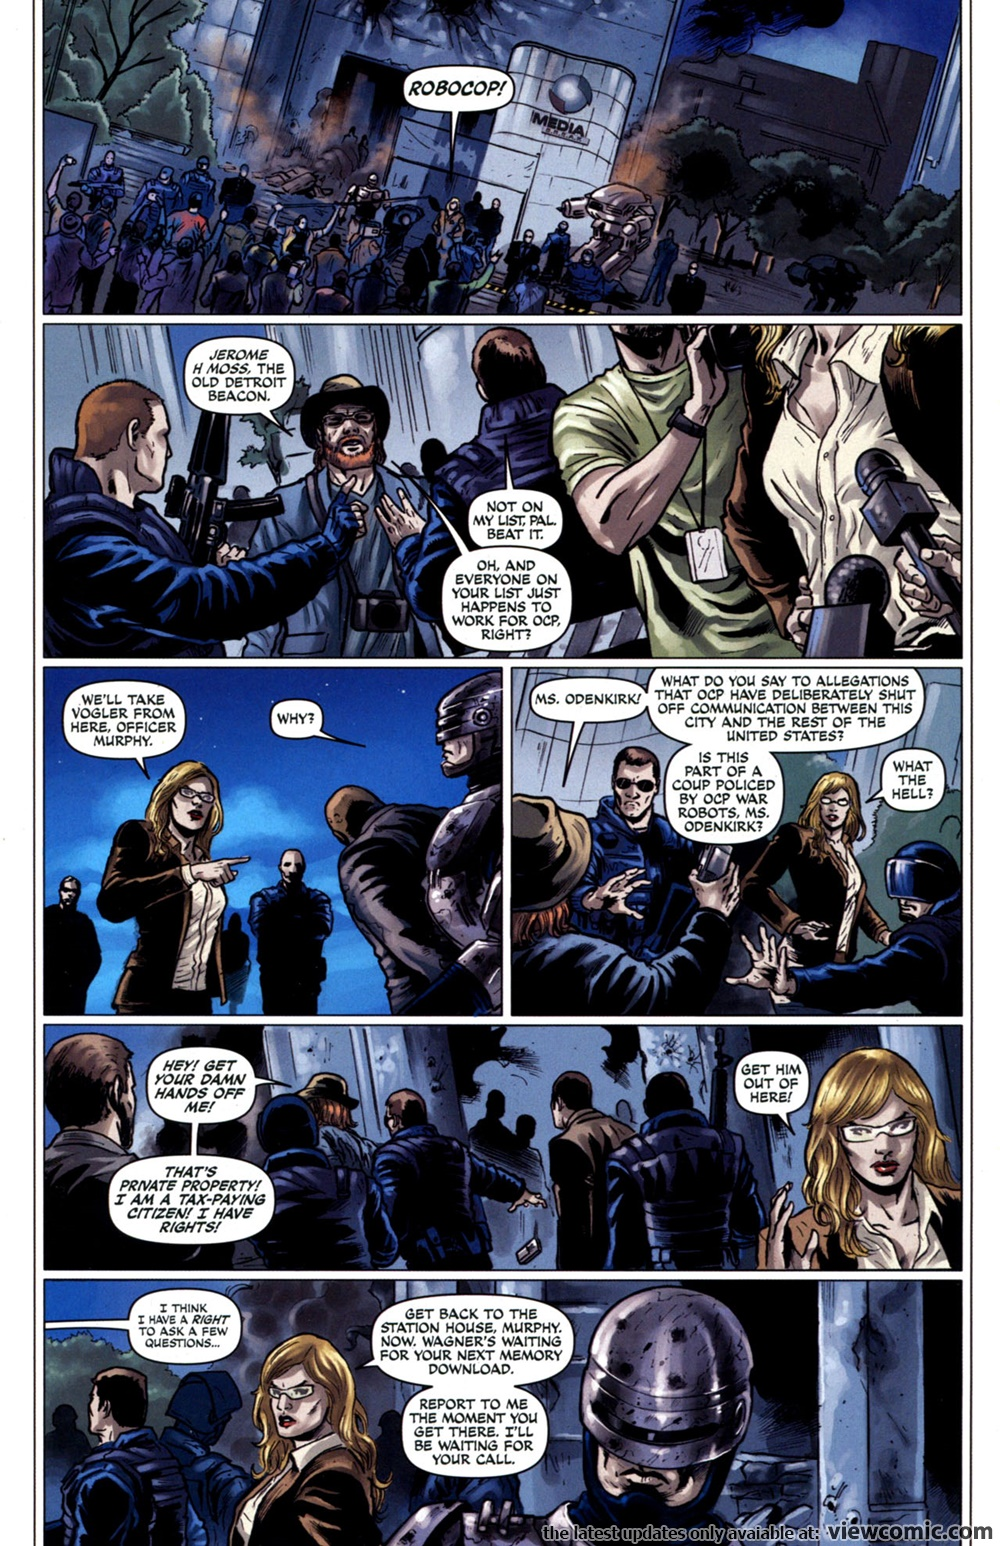 Robocop v4 03 (2010) | Vietcomic.net reading comics online for free